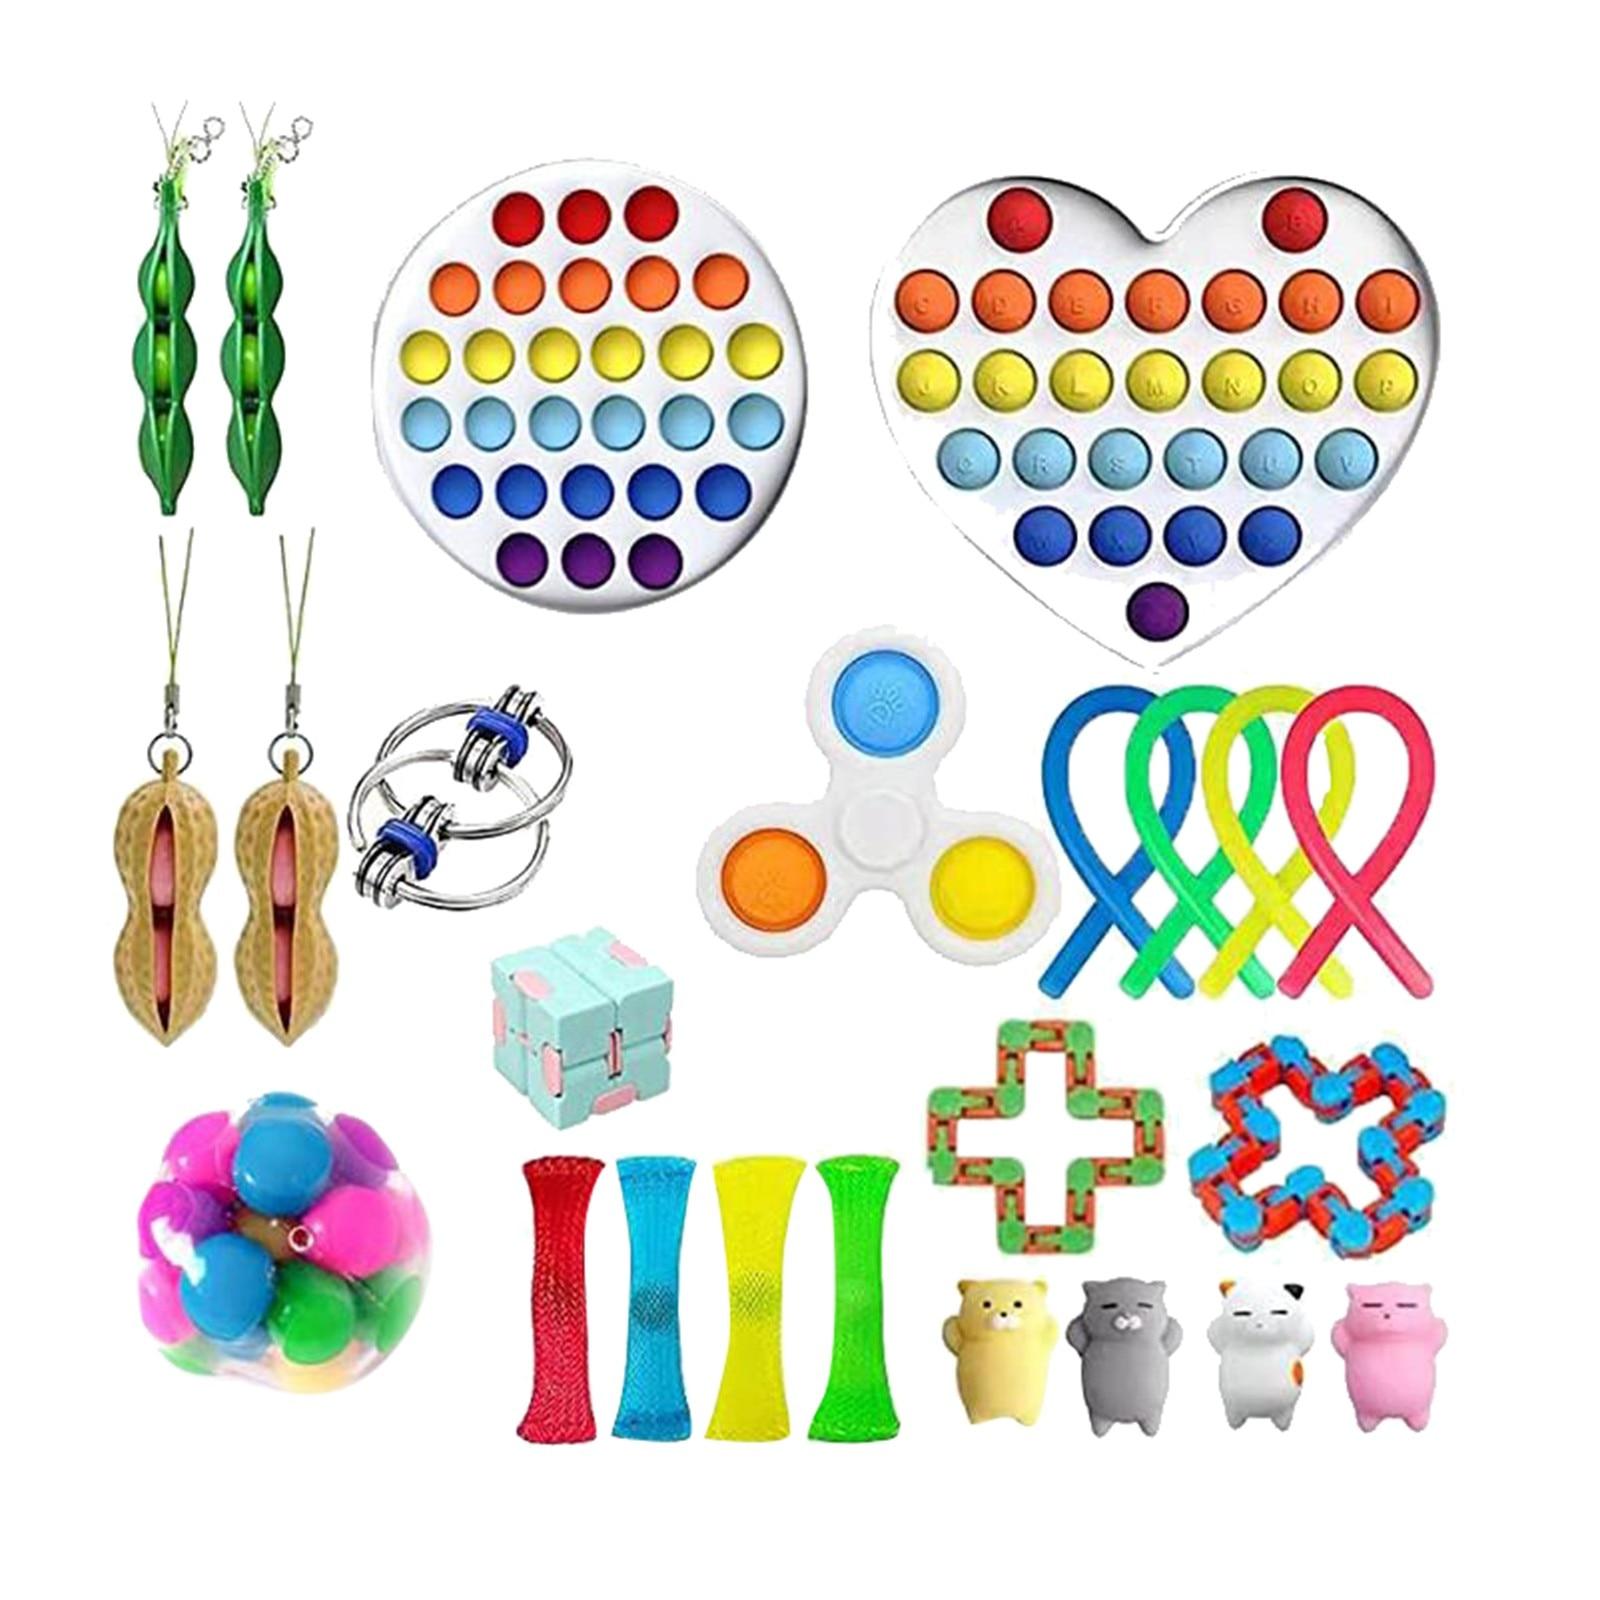 23pcs Sensory Toy Set Anti Stress Toy Sets Relief Stress Sensory Anxiety Stress Relief Toy Set Fidget Toys For Kids Adults